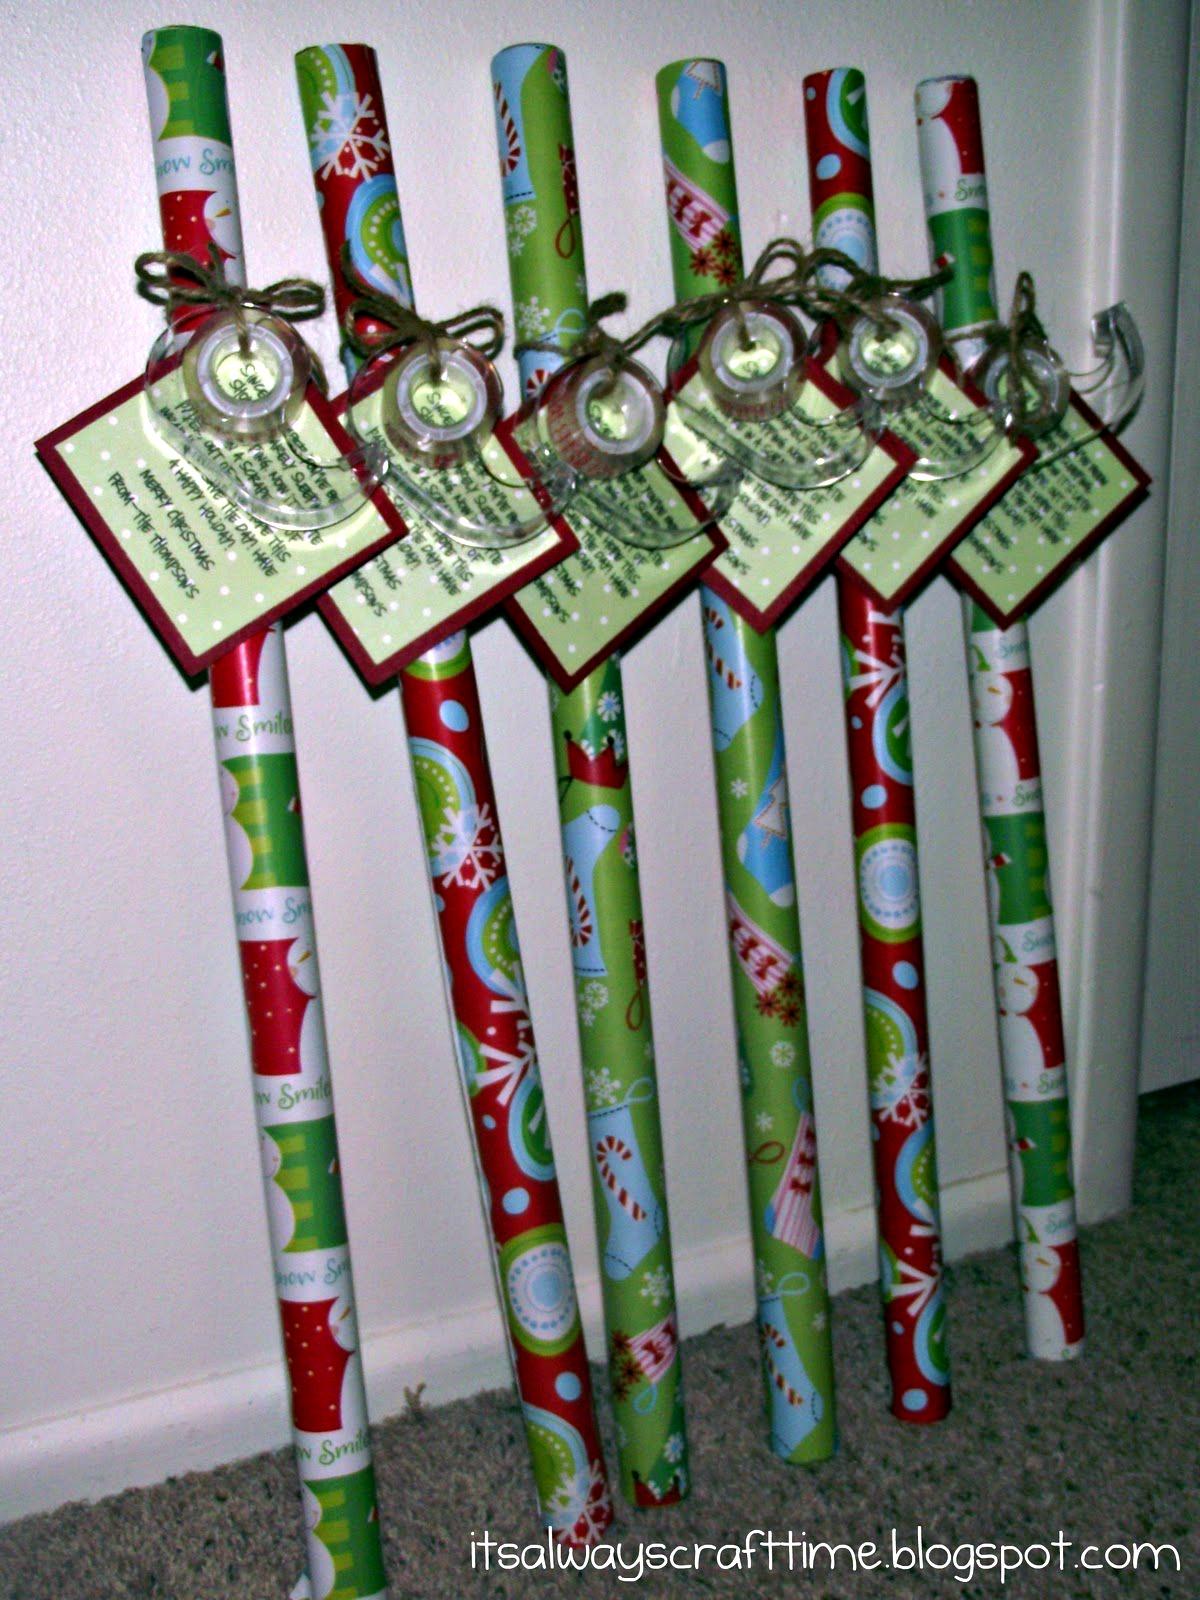 It's Always Craft Time: Neighbor Gift Idea